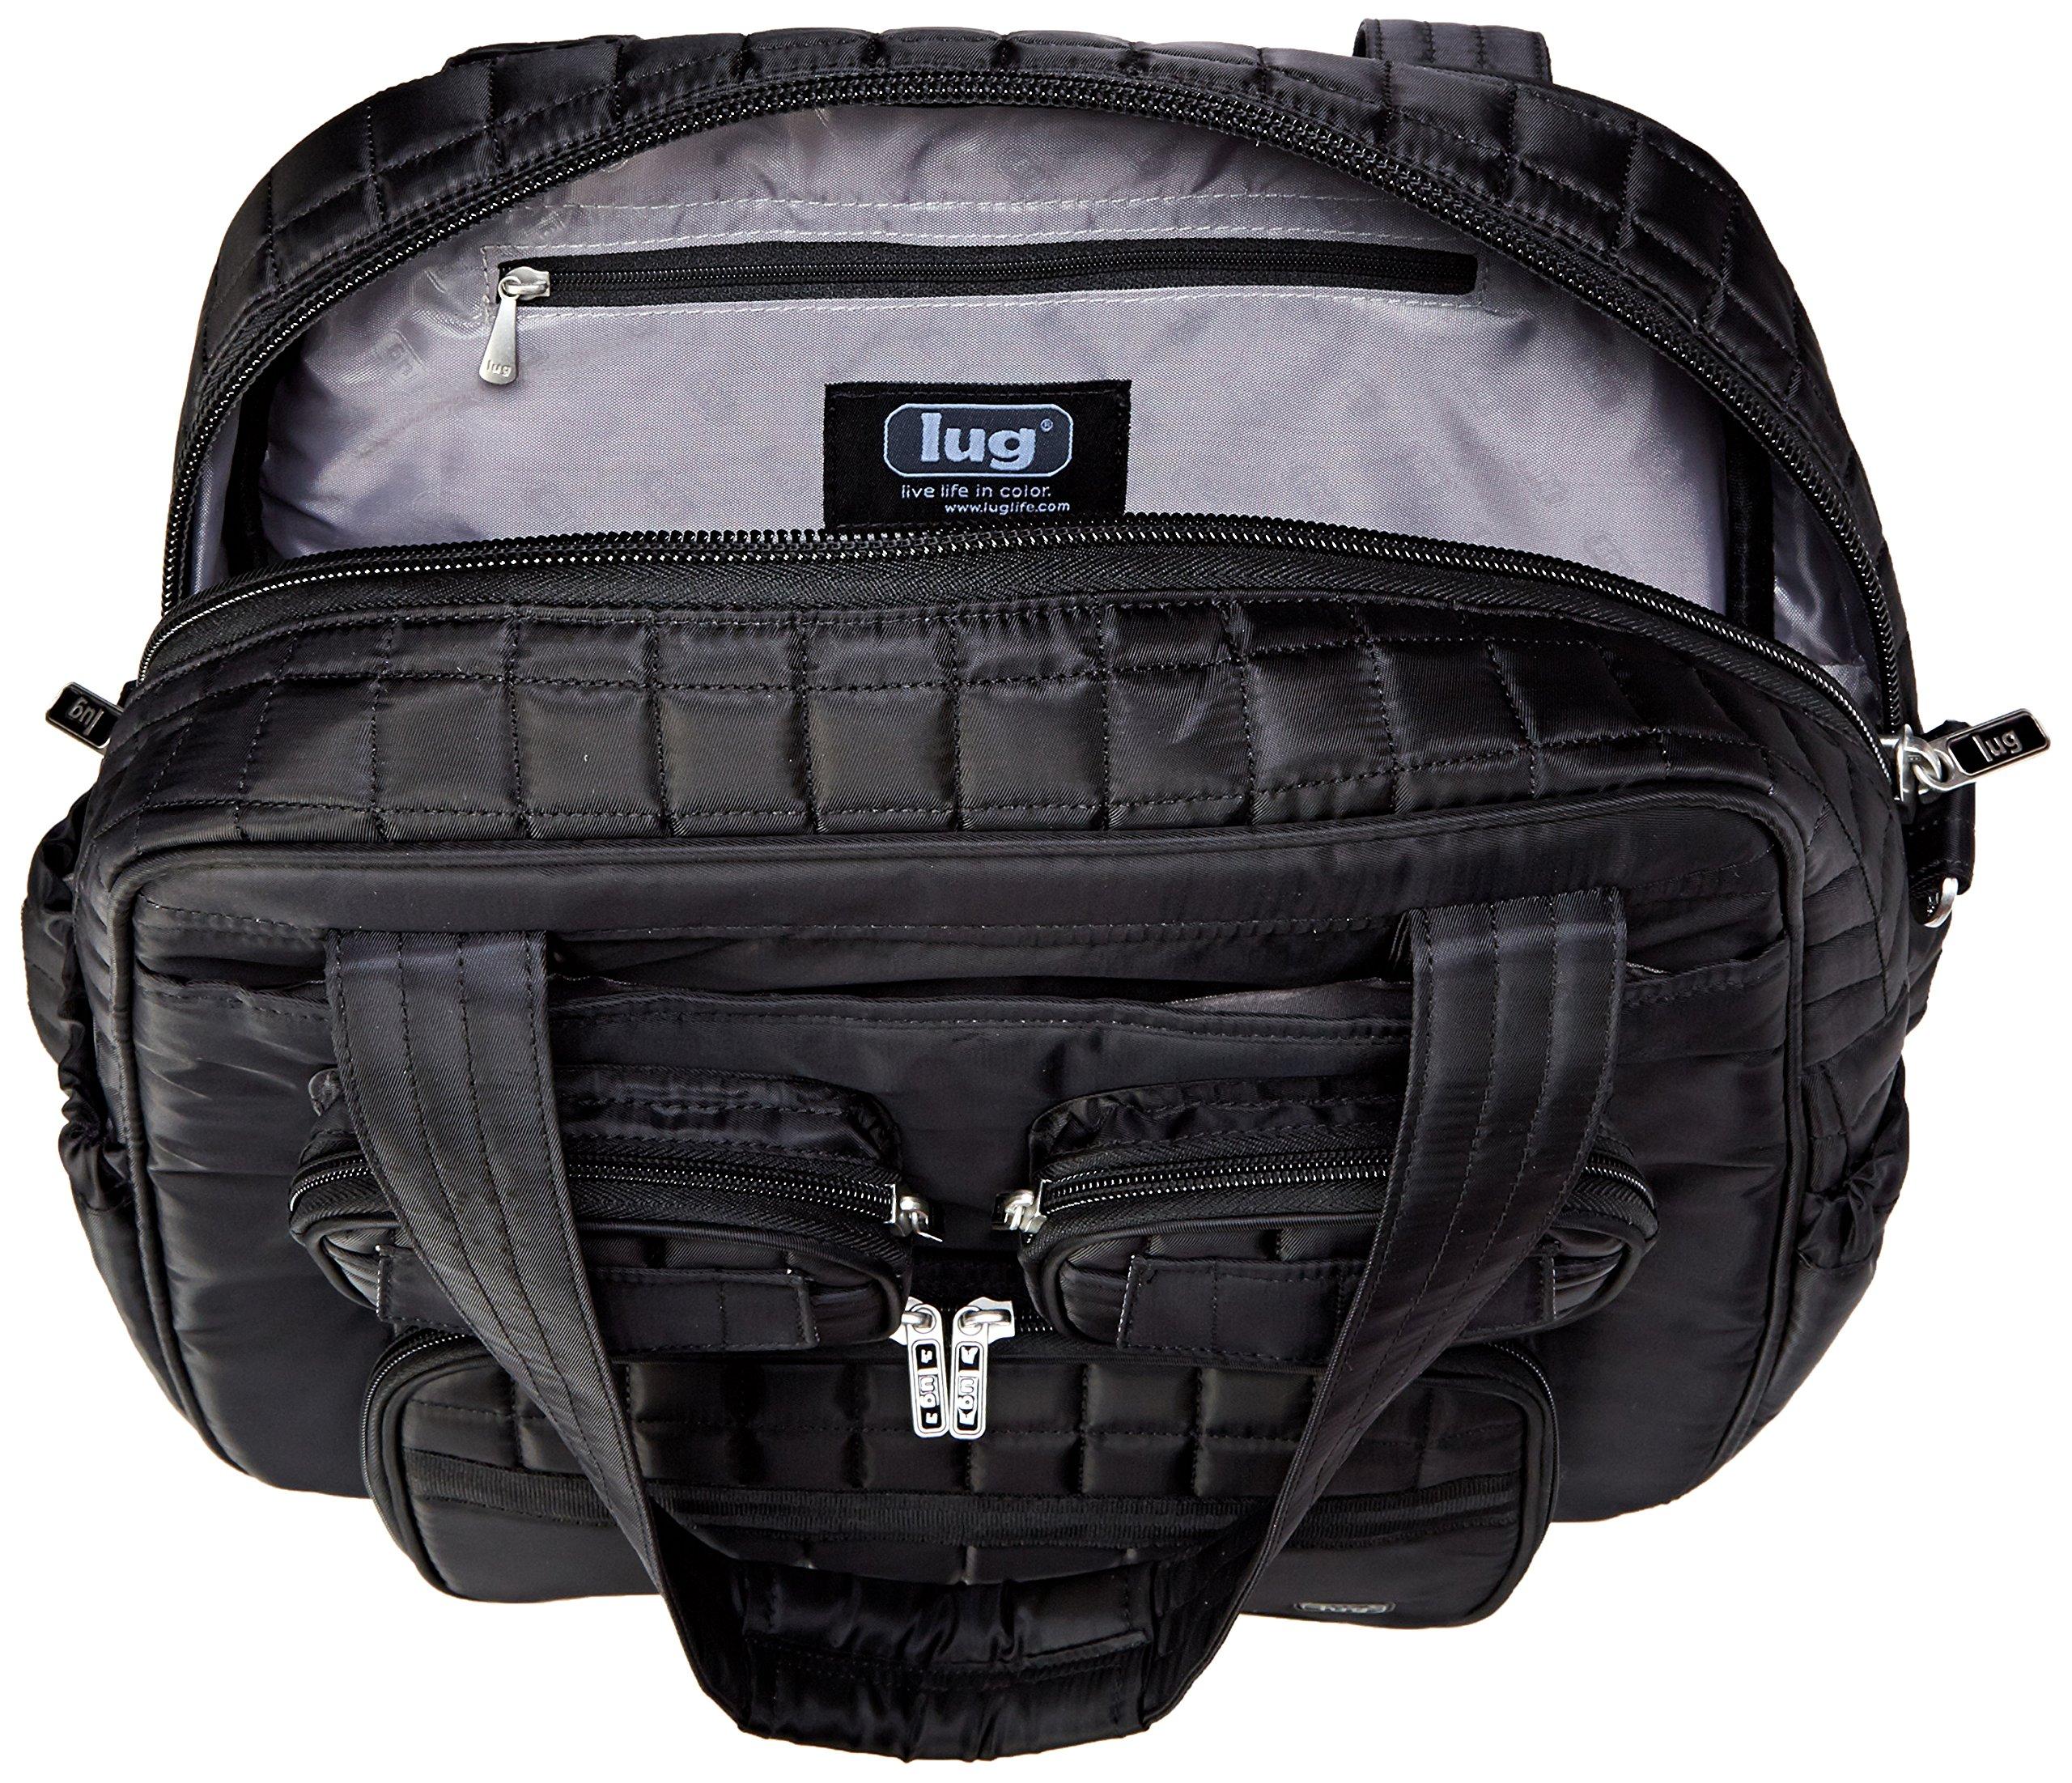 Lug Puddle Jumper Overnight/Gym Bag, Midnight Black by Lug (Image #5)